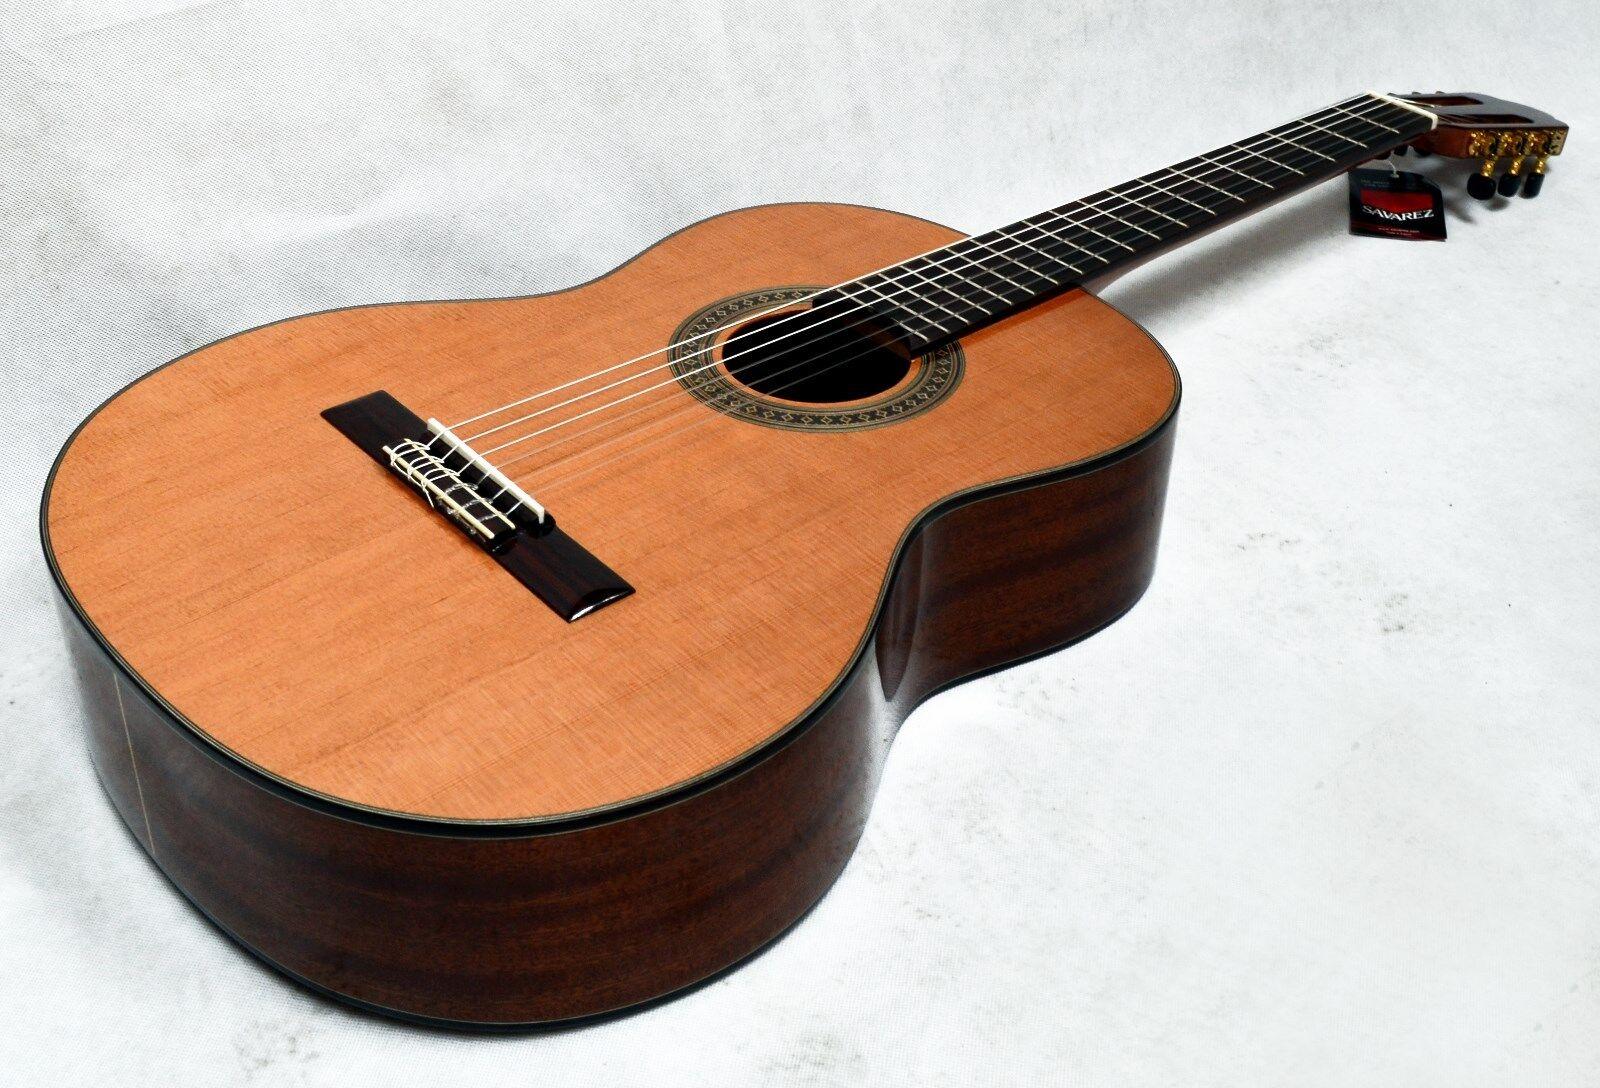 WEIHNACHTSKRACHER Gitarre 4 4 Konzertgitarre MASSIV Decke Zeder Mahagoni EDEL XX